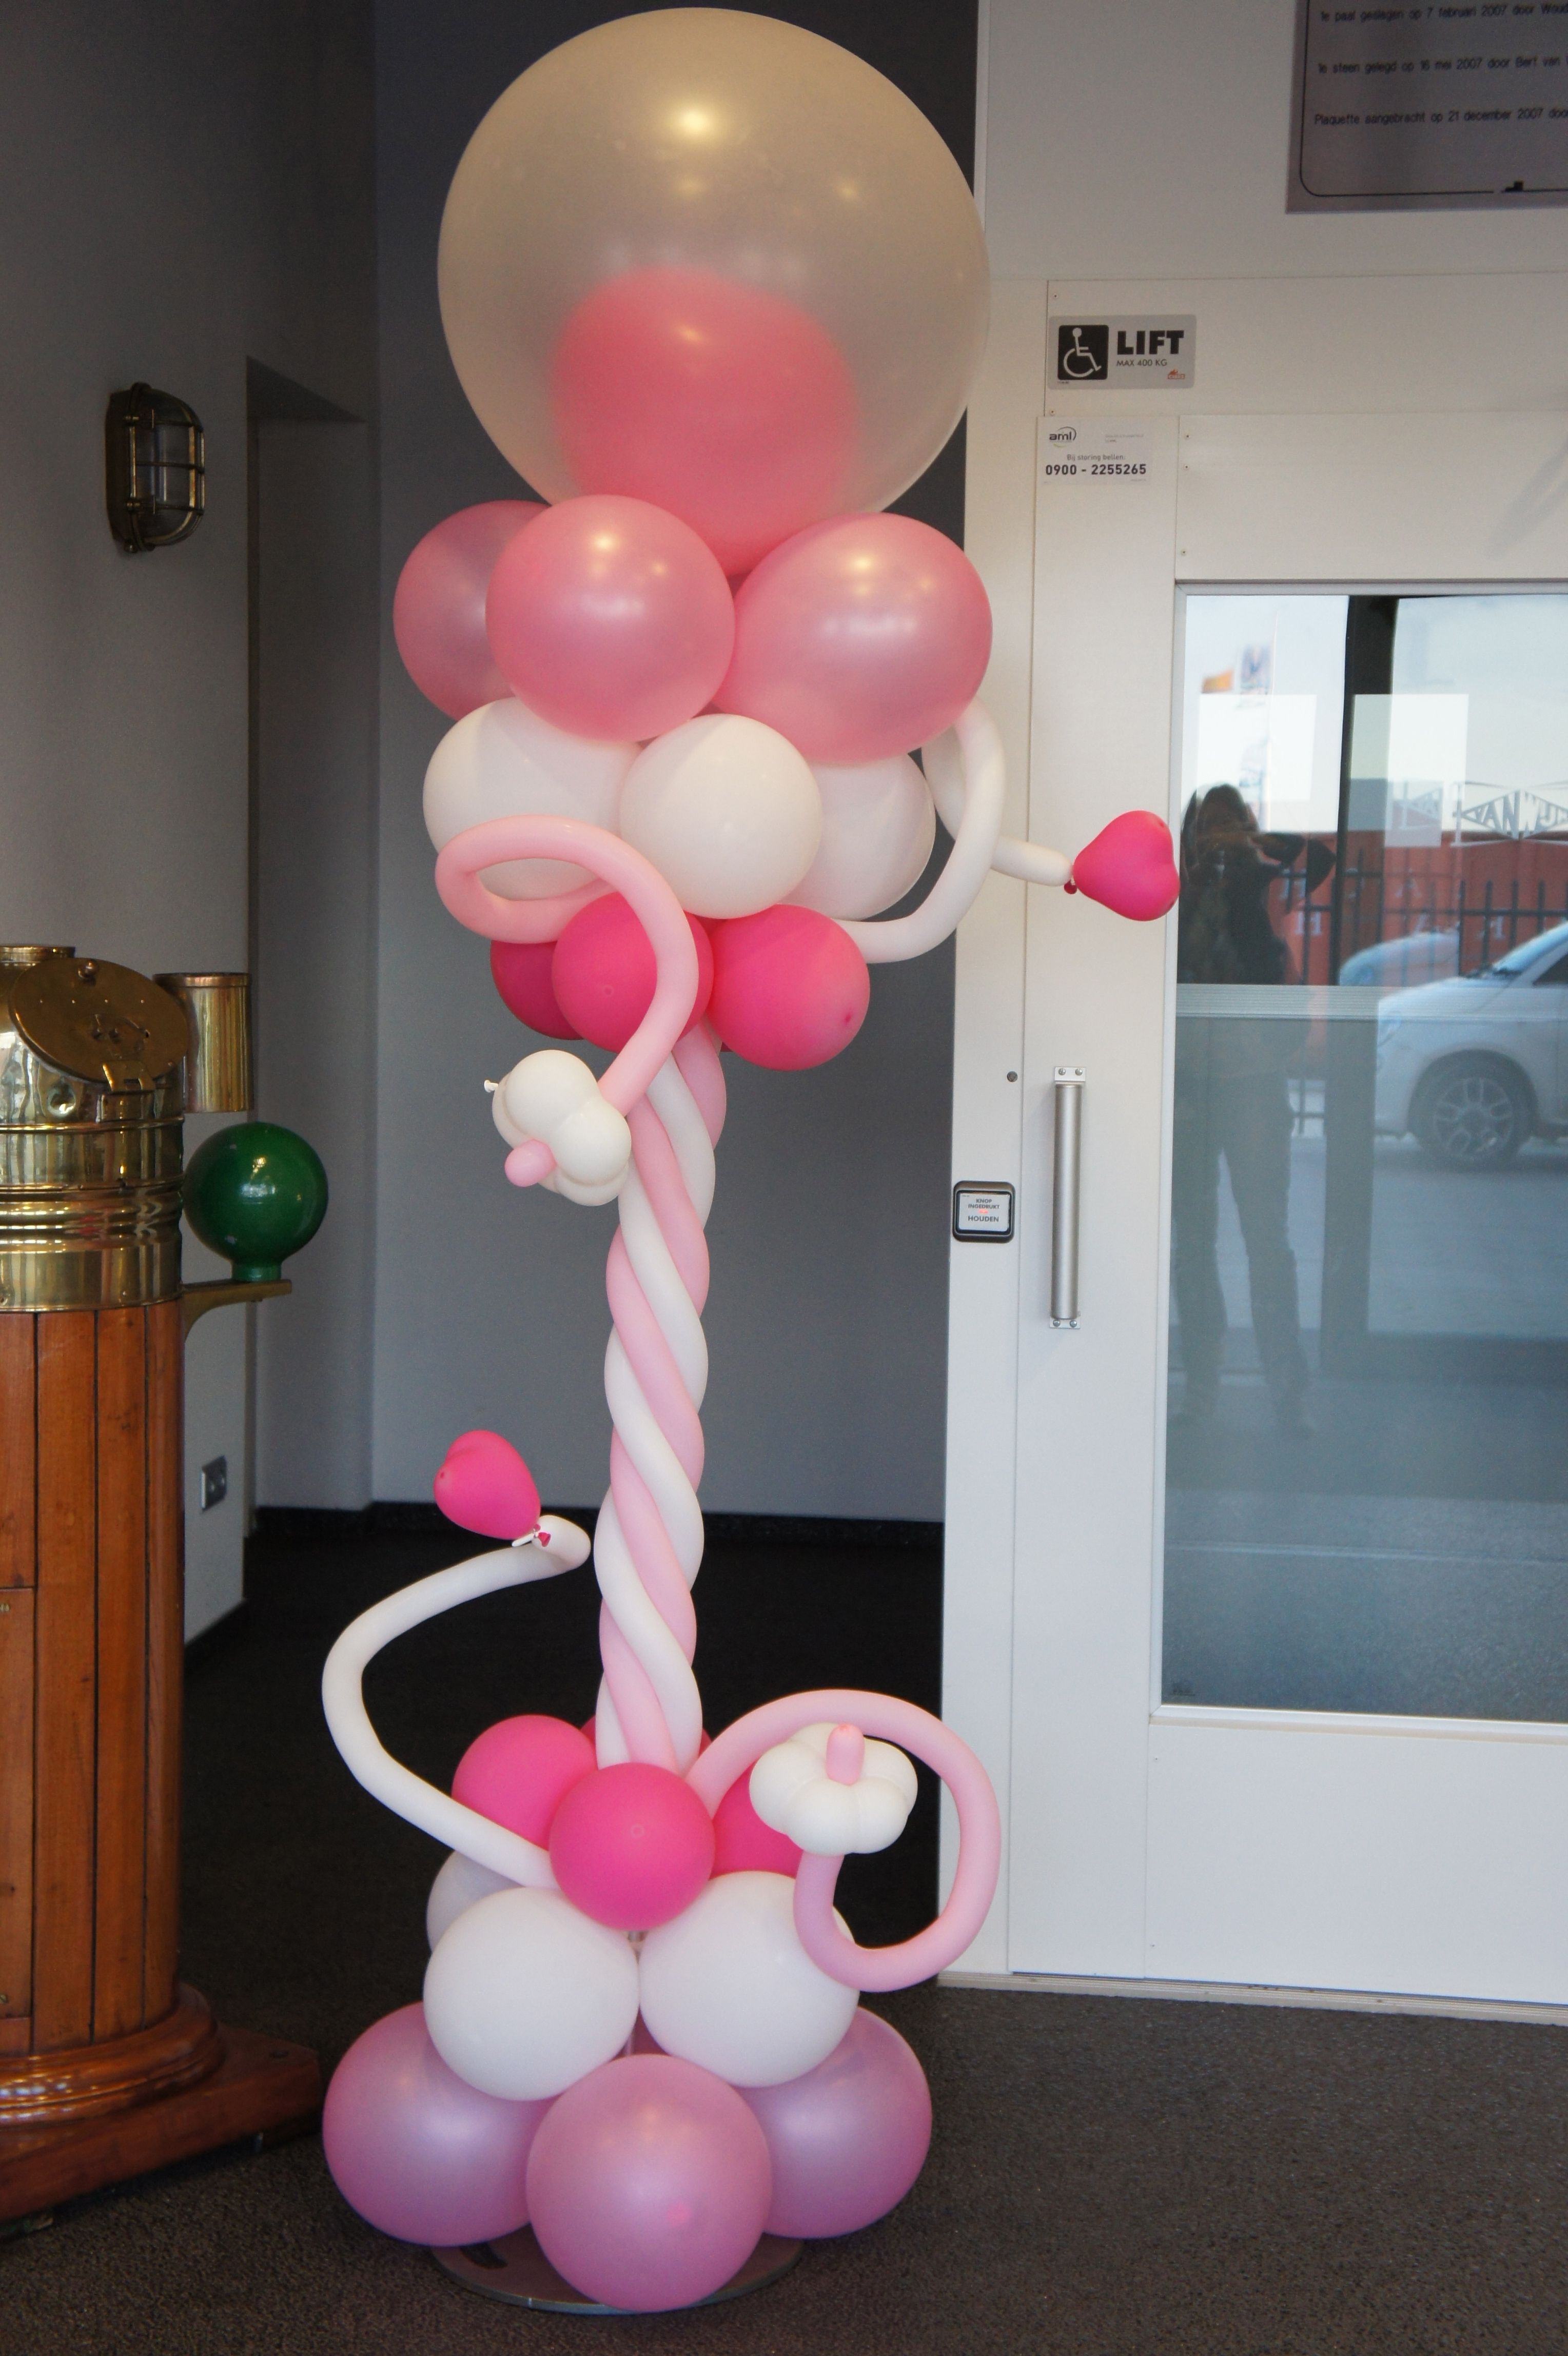 Kraamfeest decoratie ballonnen pinterest decoratie for Ballonnen decoratie zelf maken